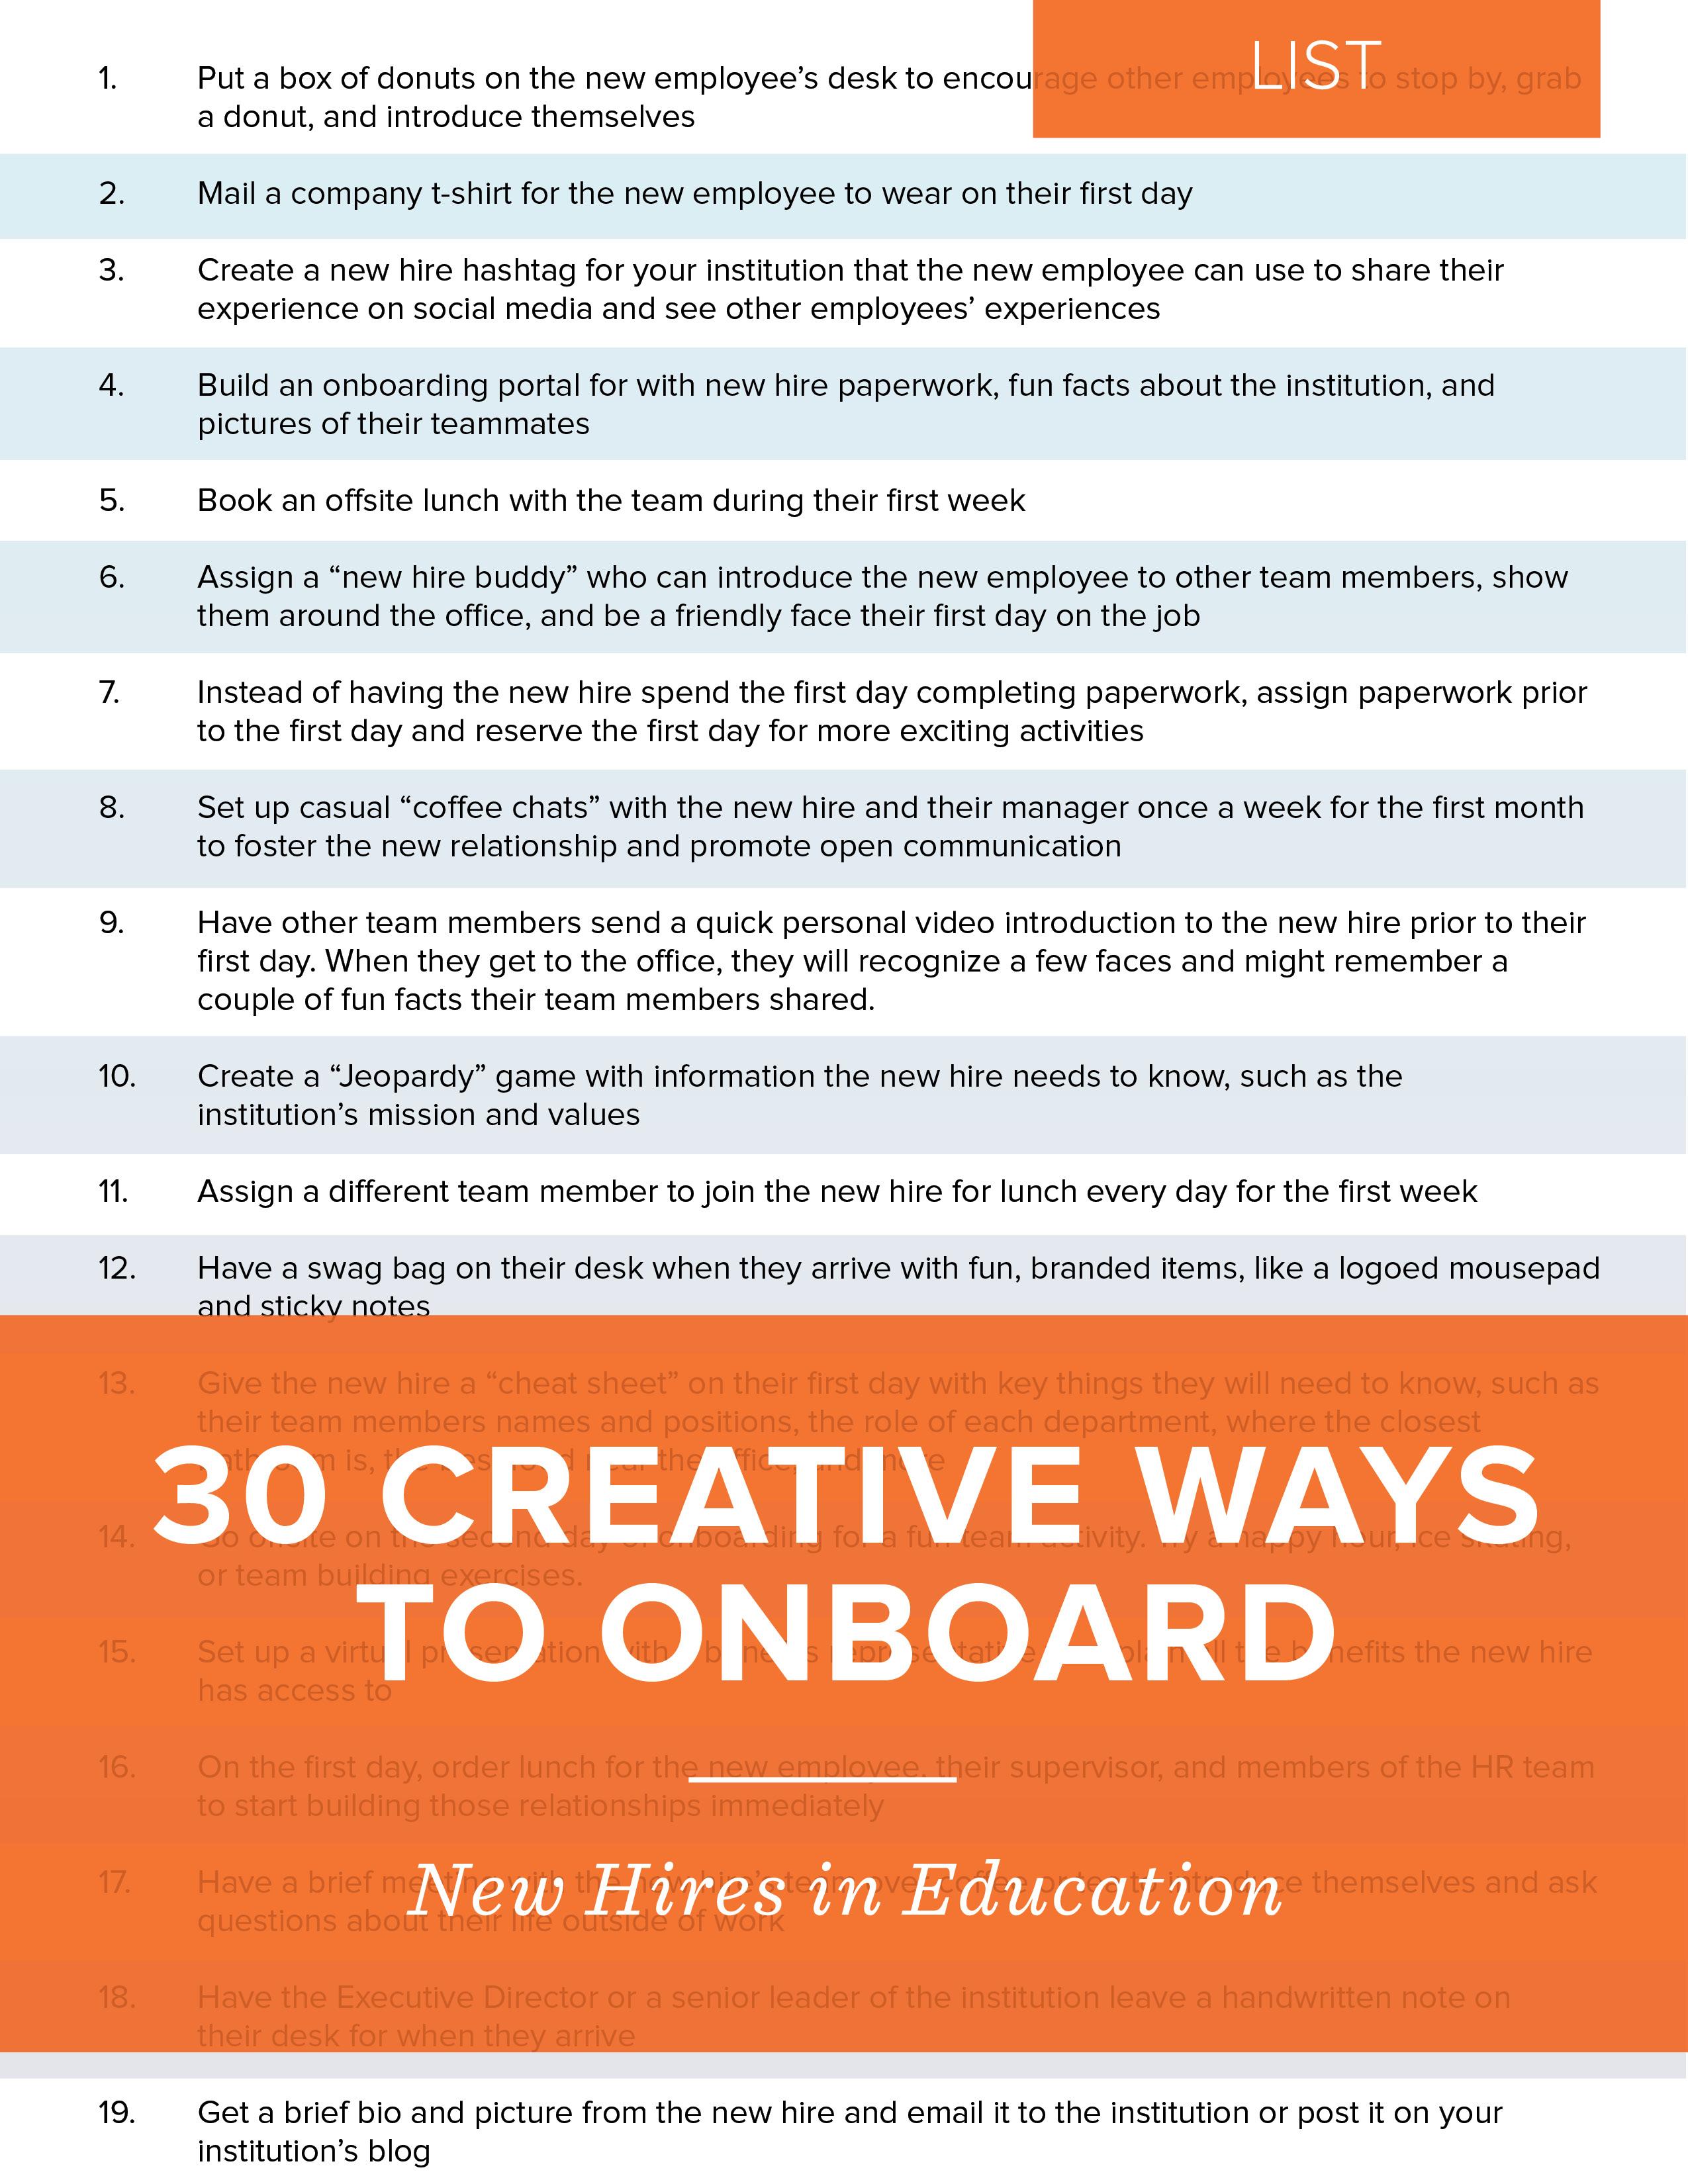 NEOED List - 30 Creative Ways to Onboard